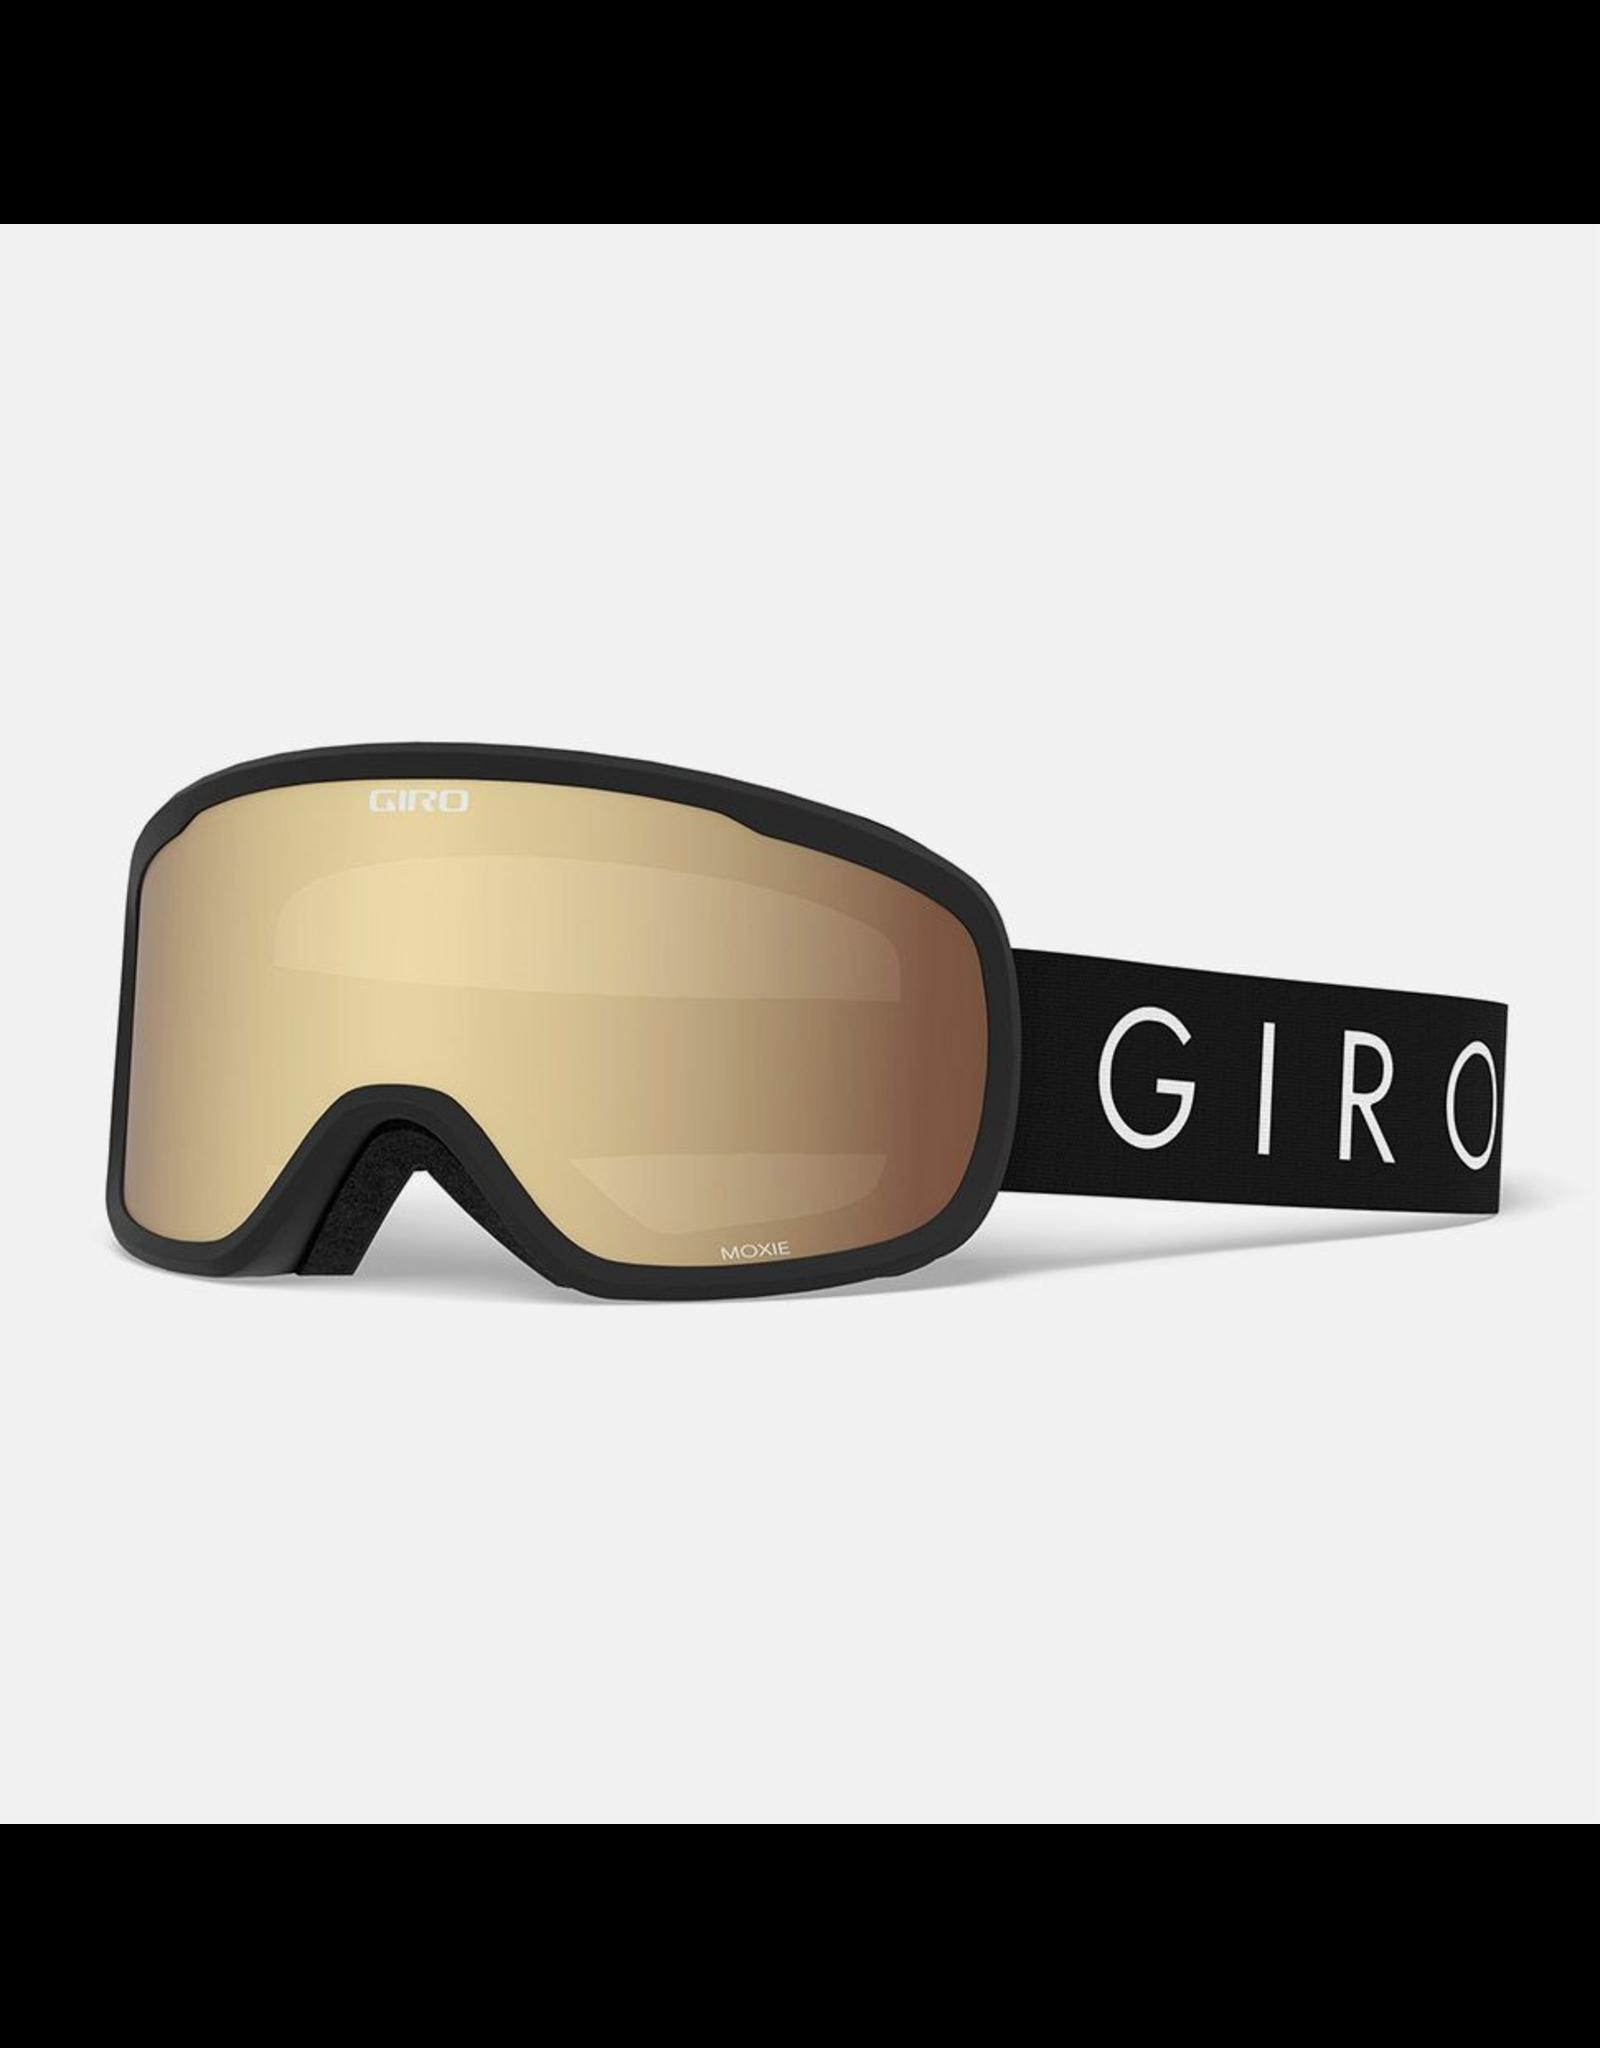 Giro GIRO MOXIE BLK CORE LIGHT AMBR GLD/YEL SR 20 SKI GOGGLE